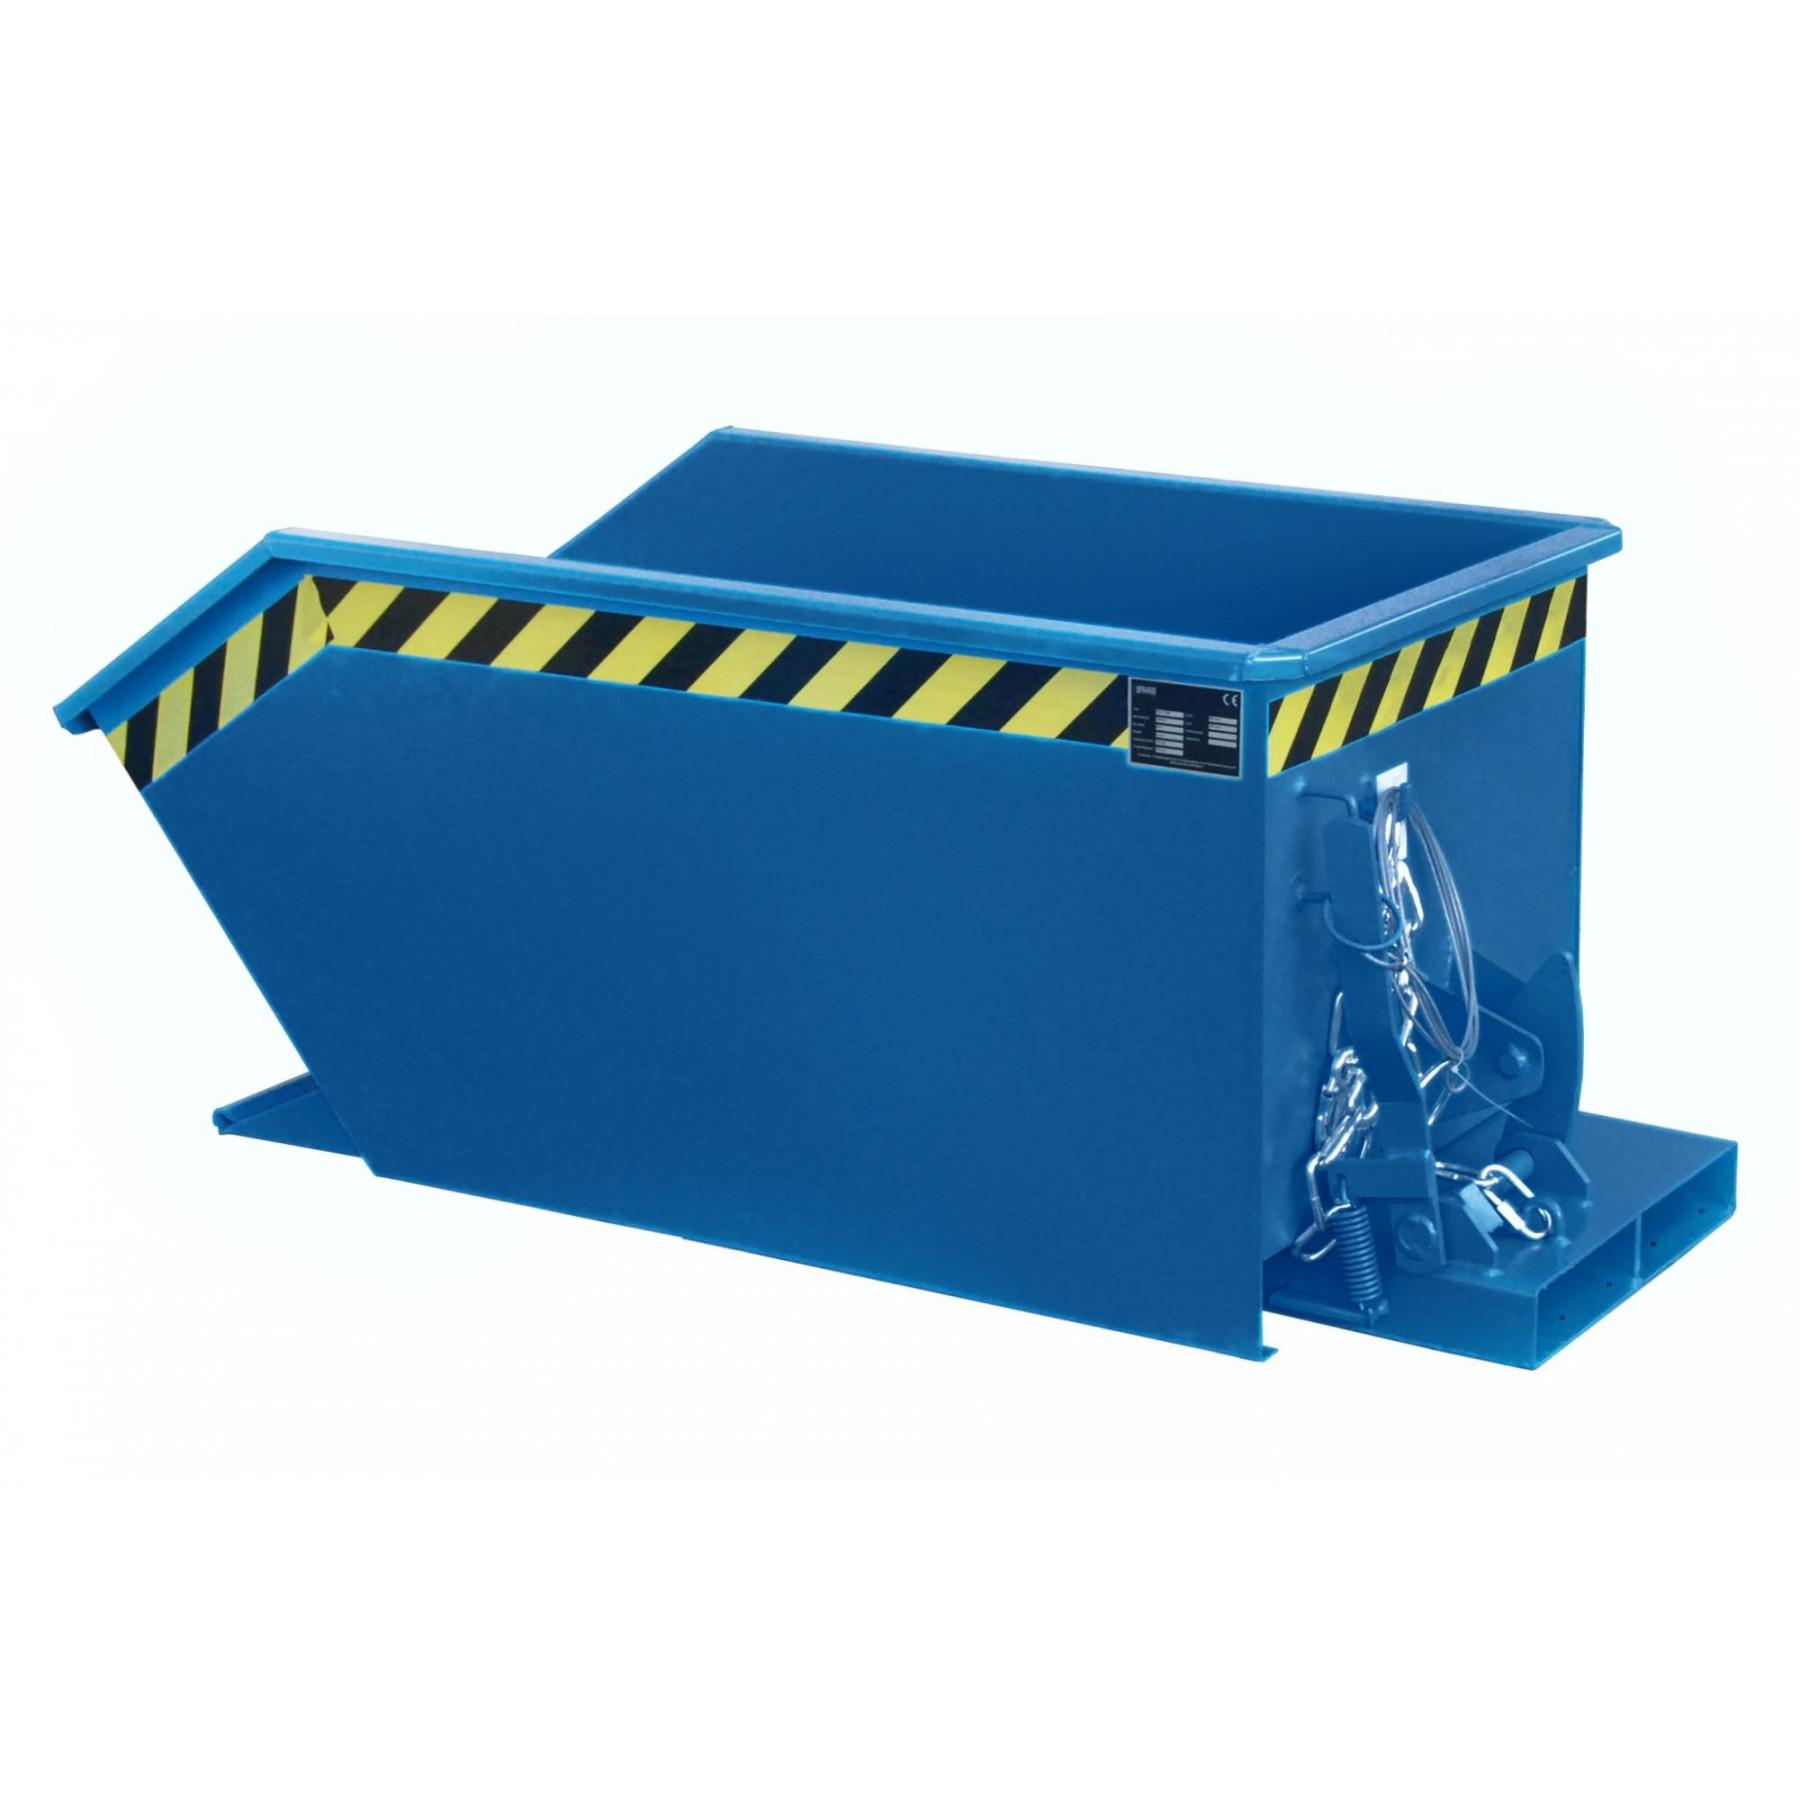 Kiepcontainer 300 liter, laag model, MTFL-300-5001